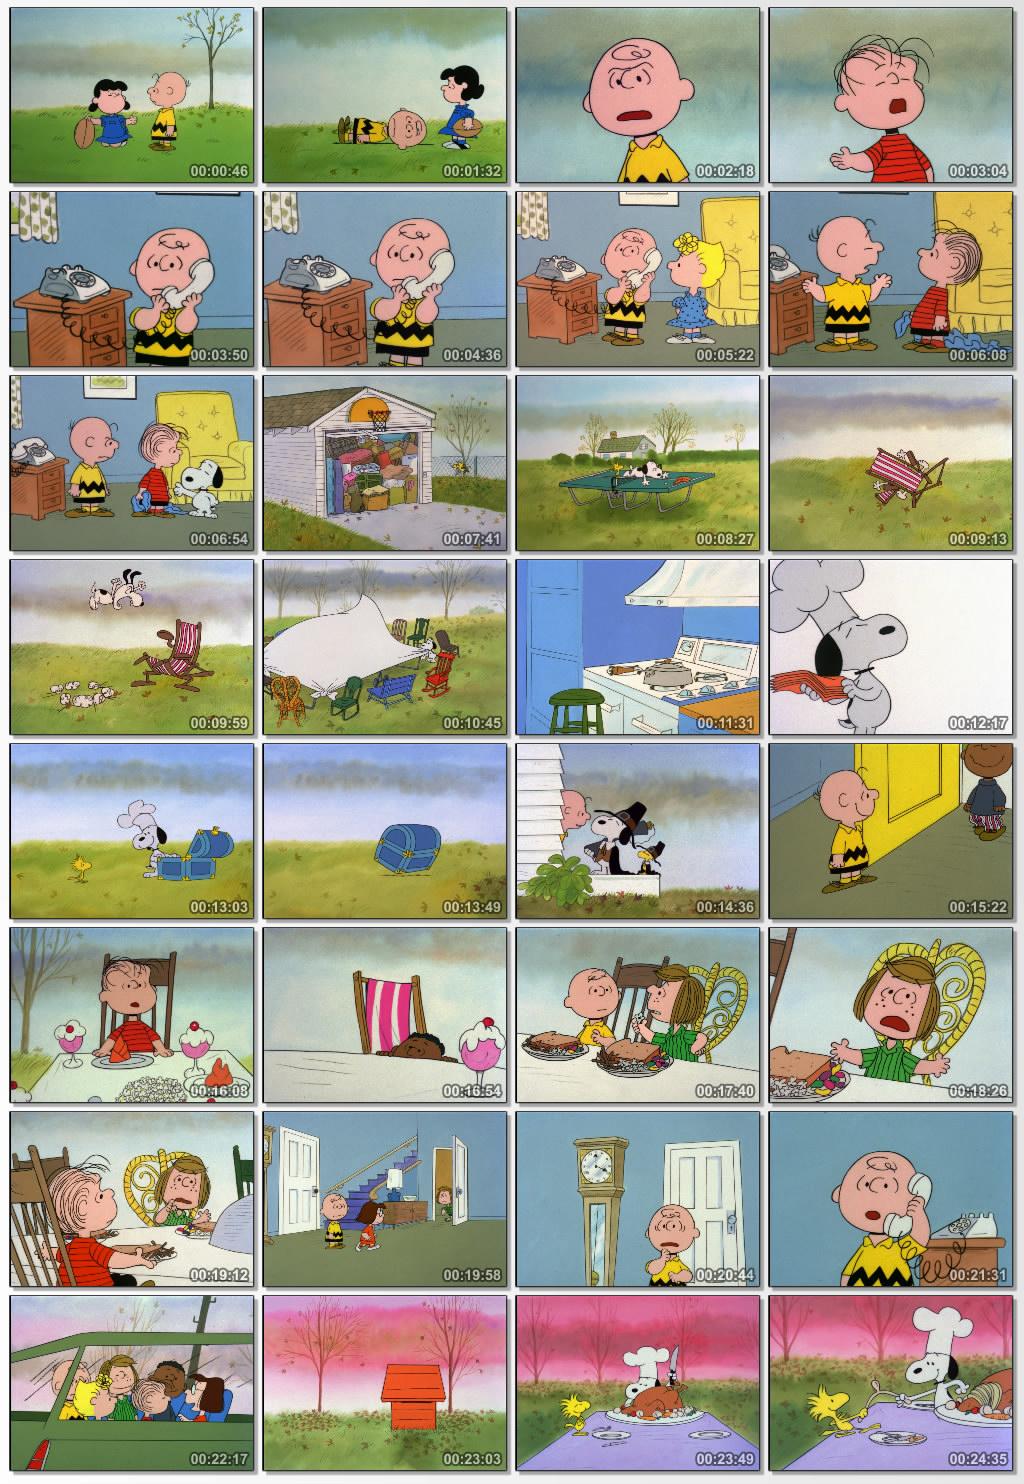 دانلود انیمیشن کارتونی A Charlie Brown Thanksgiving 1973